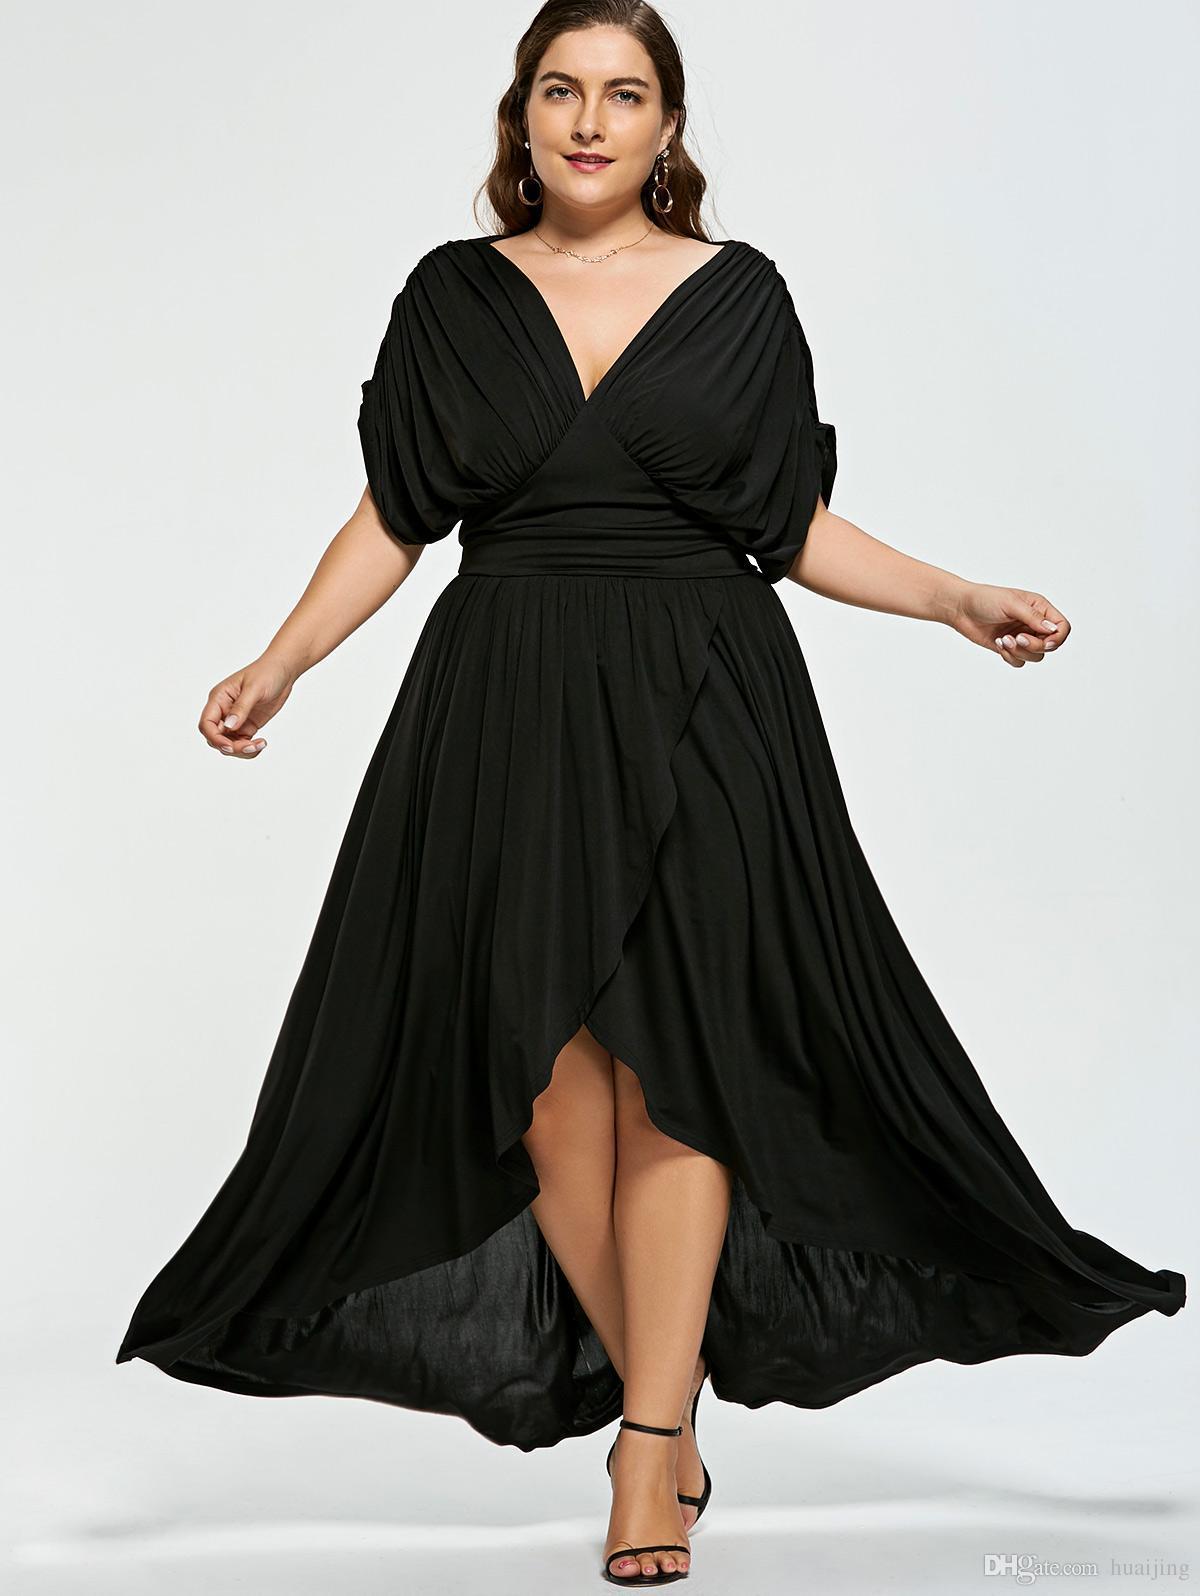 82a4b0d36afb2 Gamiss Plus Size V Neck Women Summer Dress Short Sleeve Party Dress  Floor-Length Empire Waist Maxi Formal Jersey